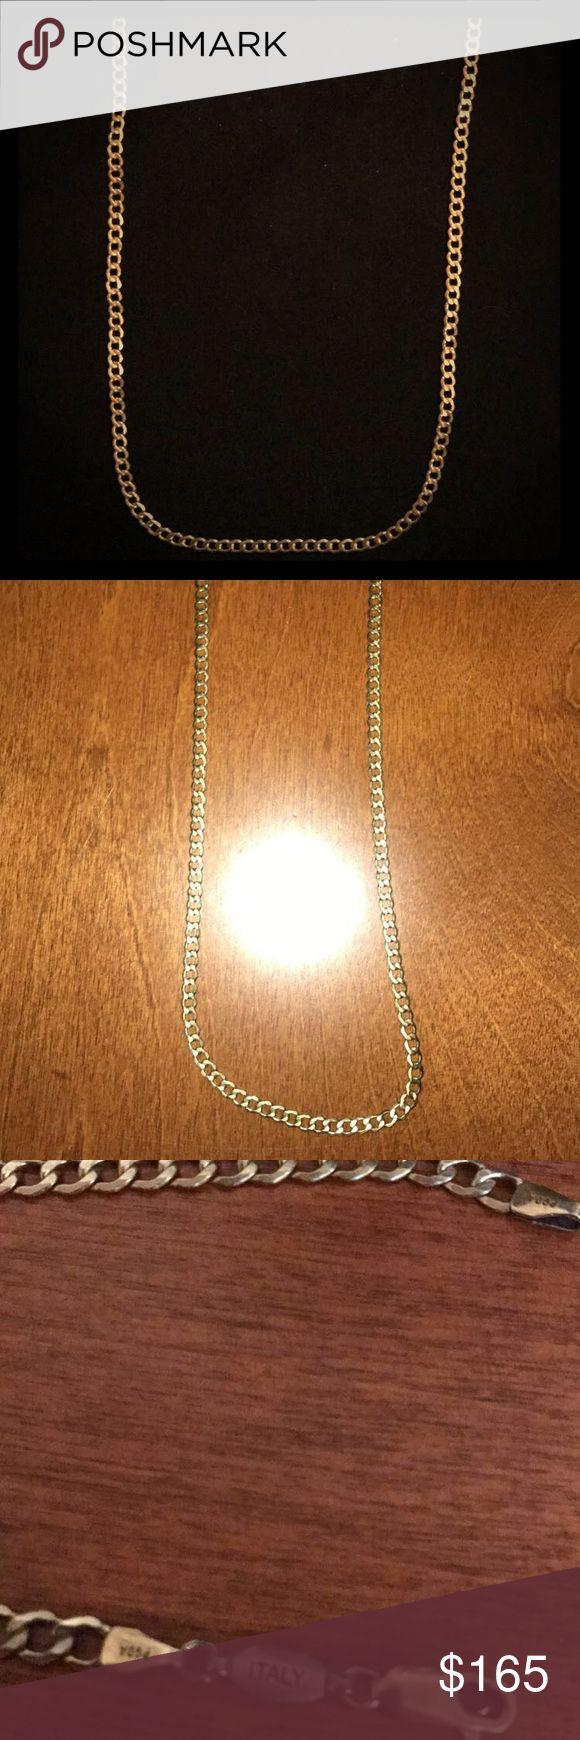 14k Italian Gold Chain 18 inches pagoda Accessories Jewelry